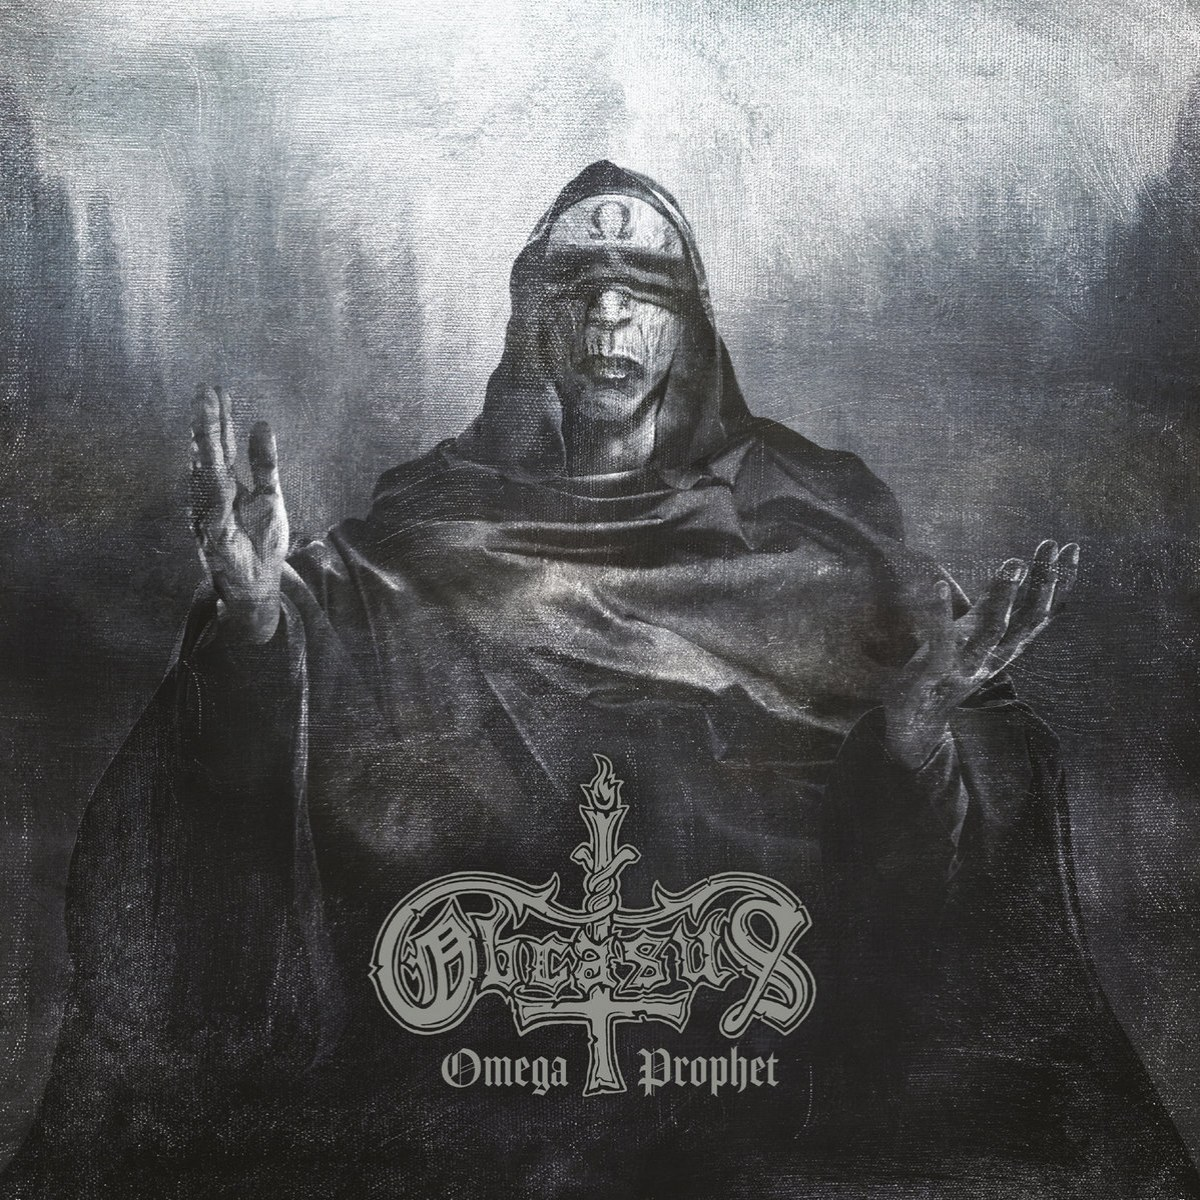 Obcasus - Omega Prophet